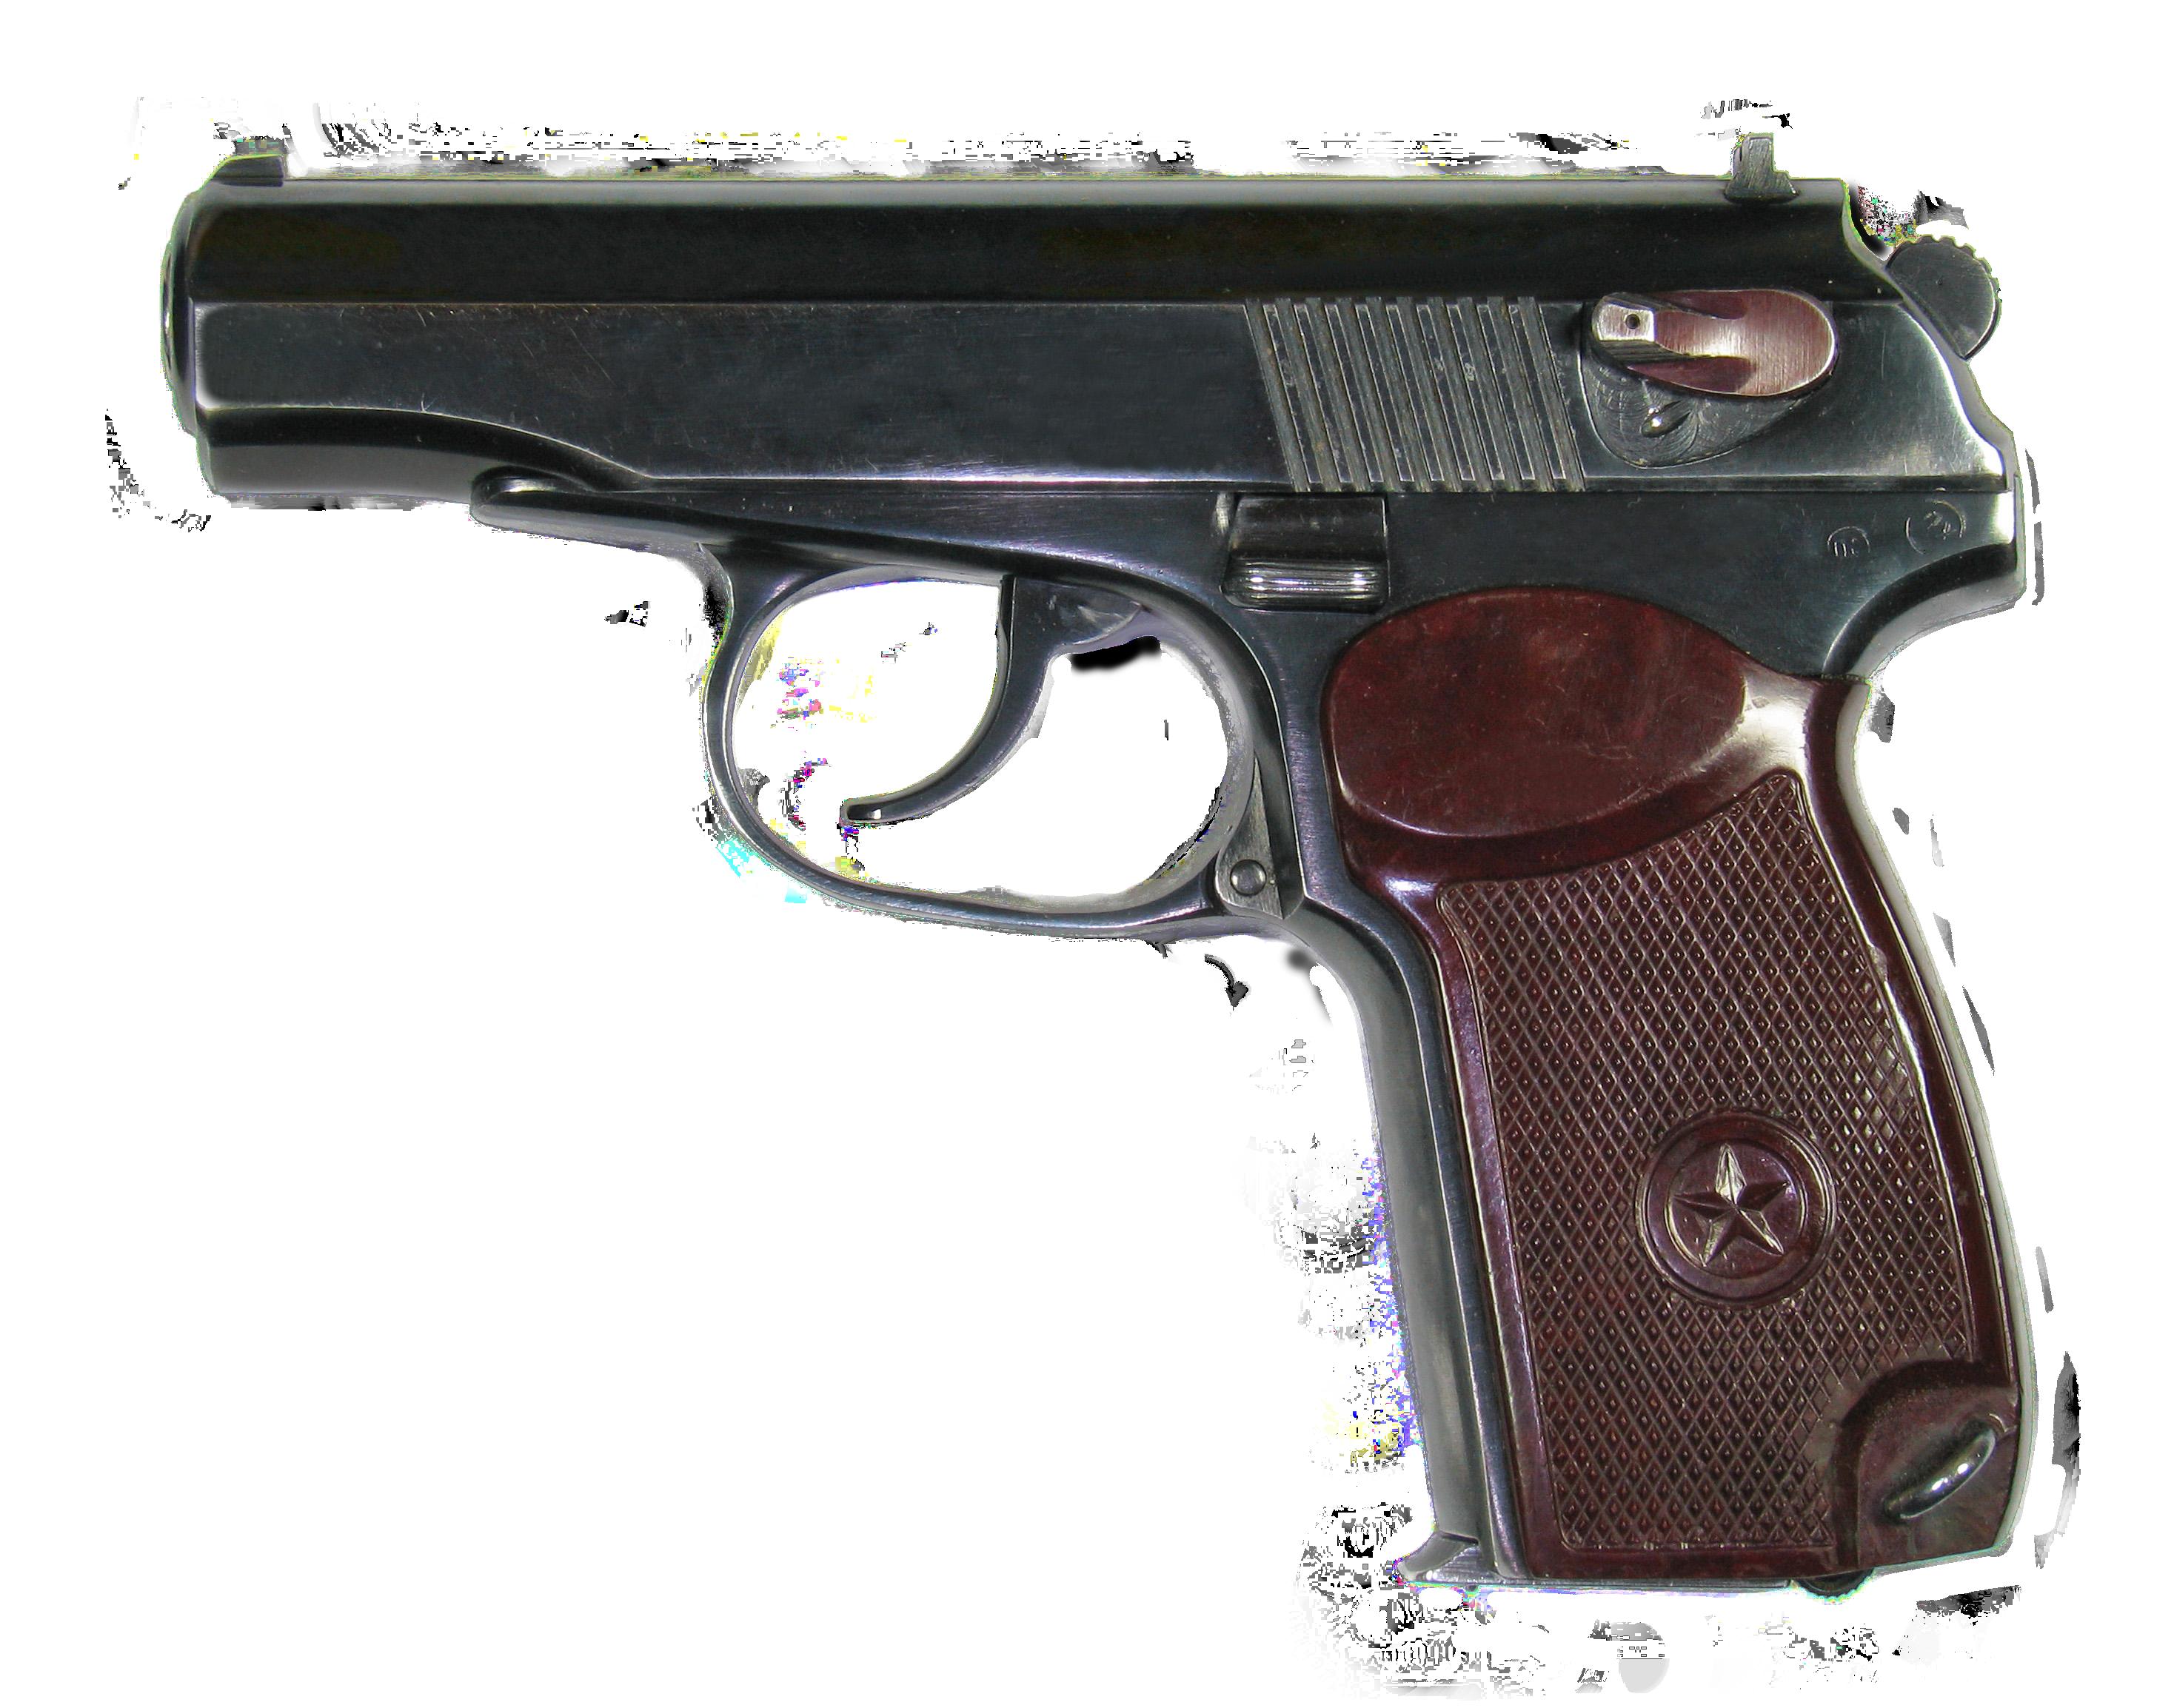 Sherriff gun